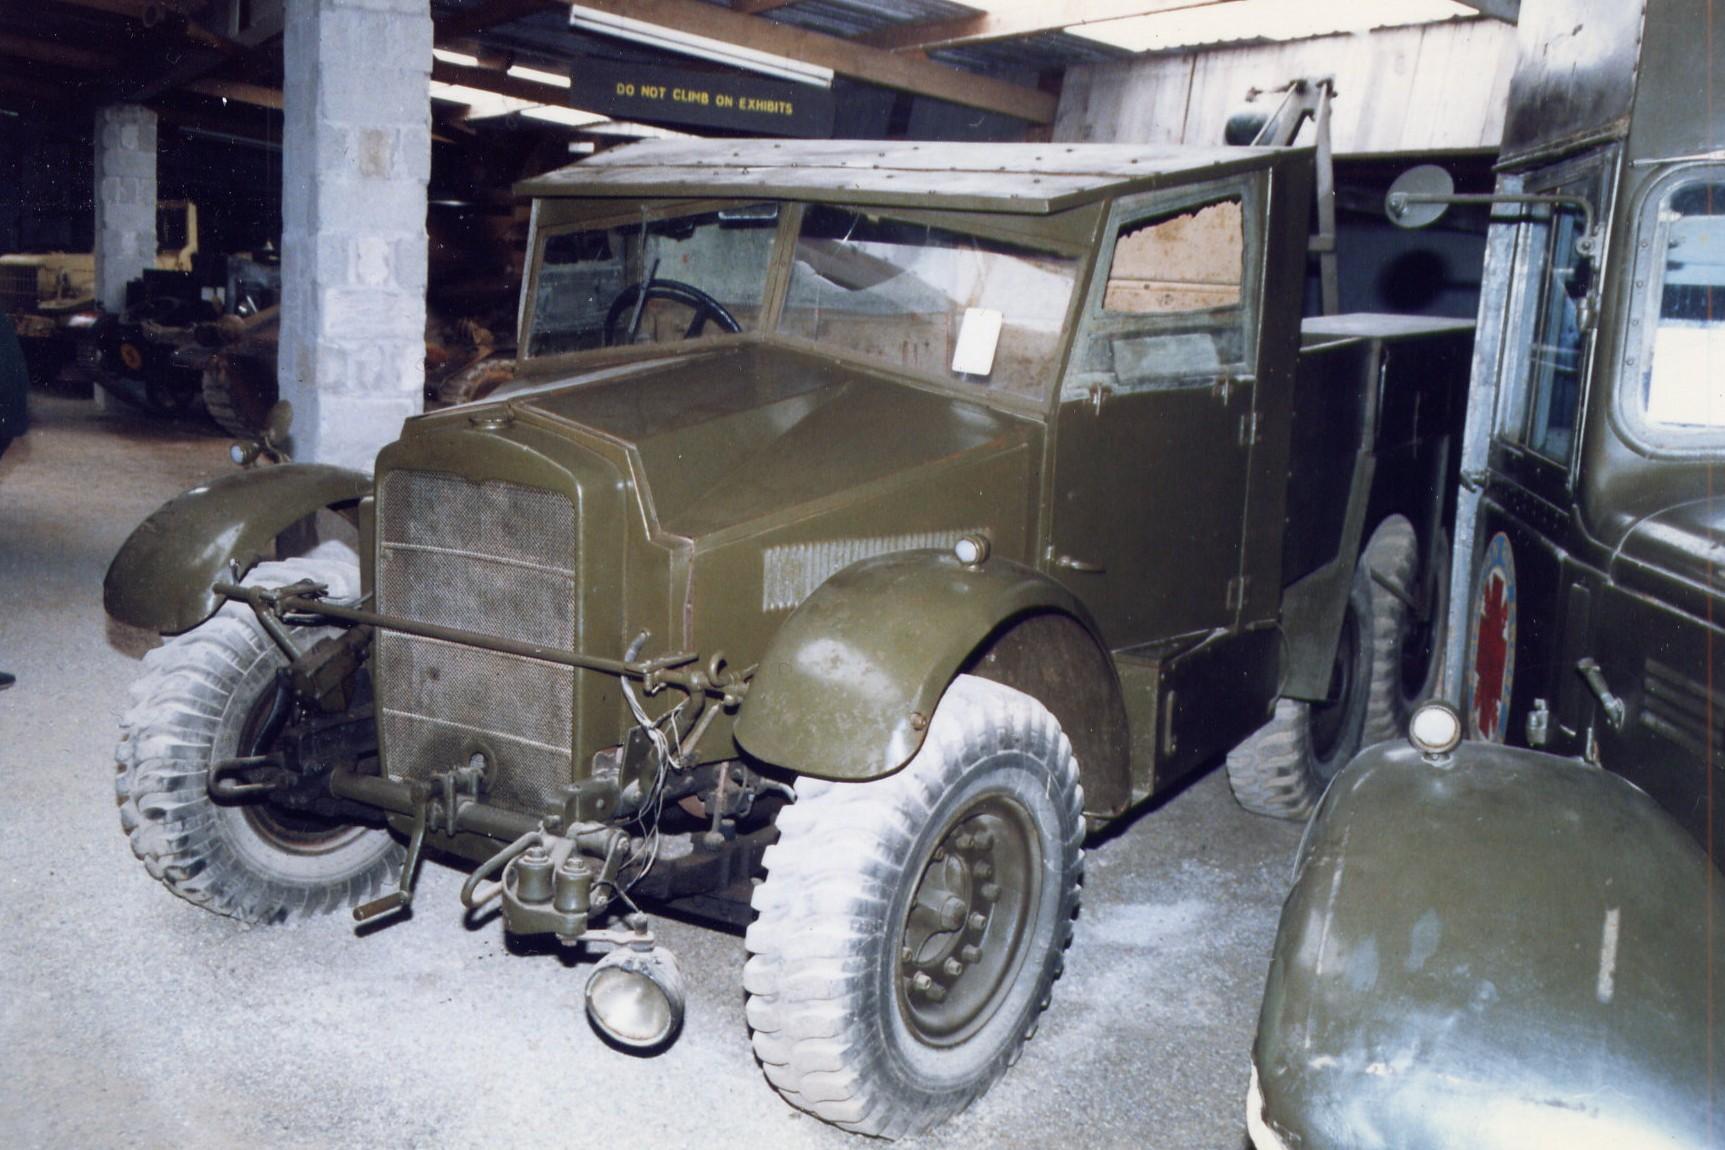 Military items | Military vehicles | Military trucks | Military Badge Collection » Lamanva ...